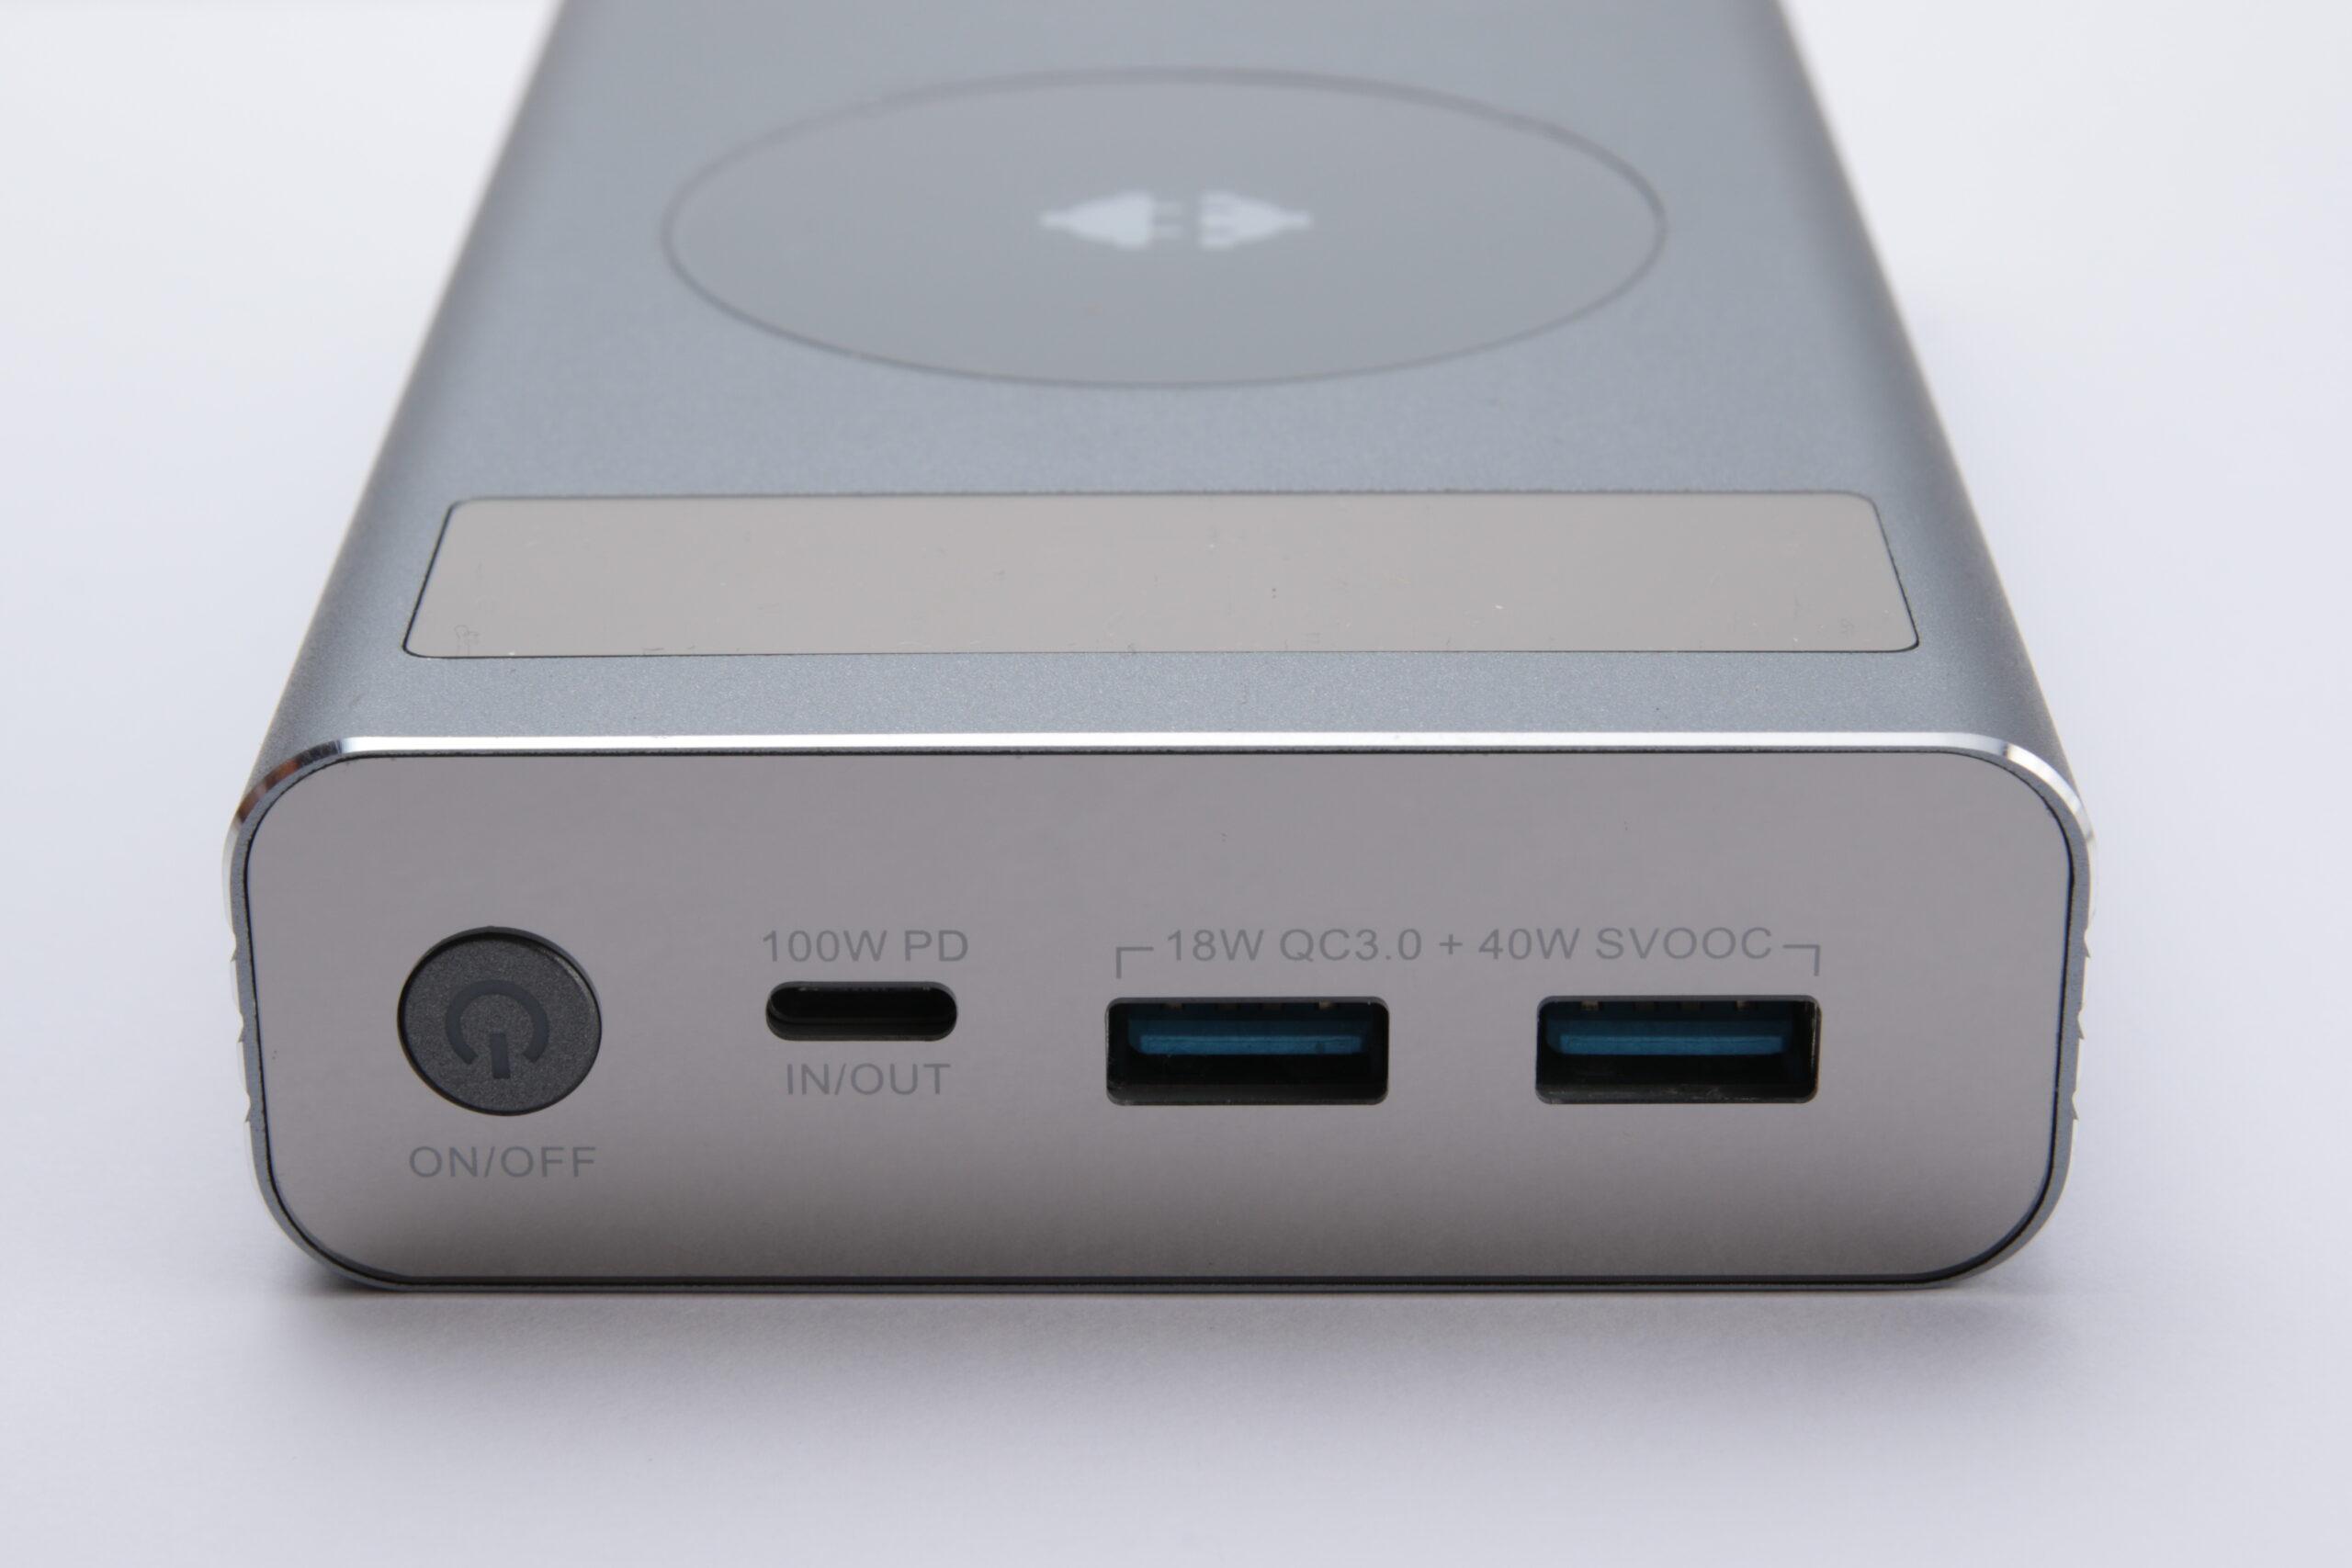 AKRYPS 20000mAh ワイヤレス充電器 Tesla™グラフェンバッテリー搭載